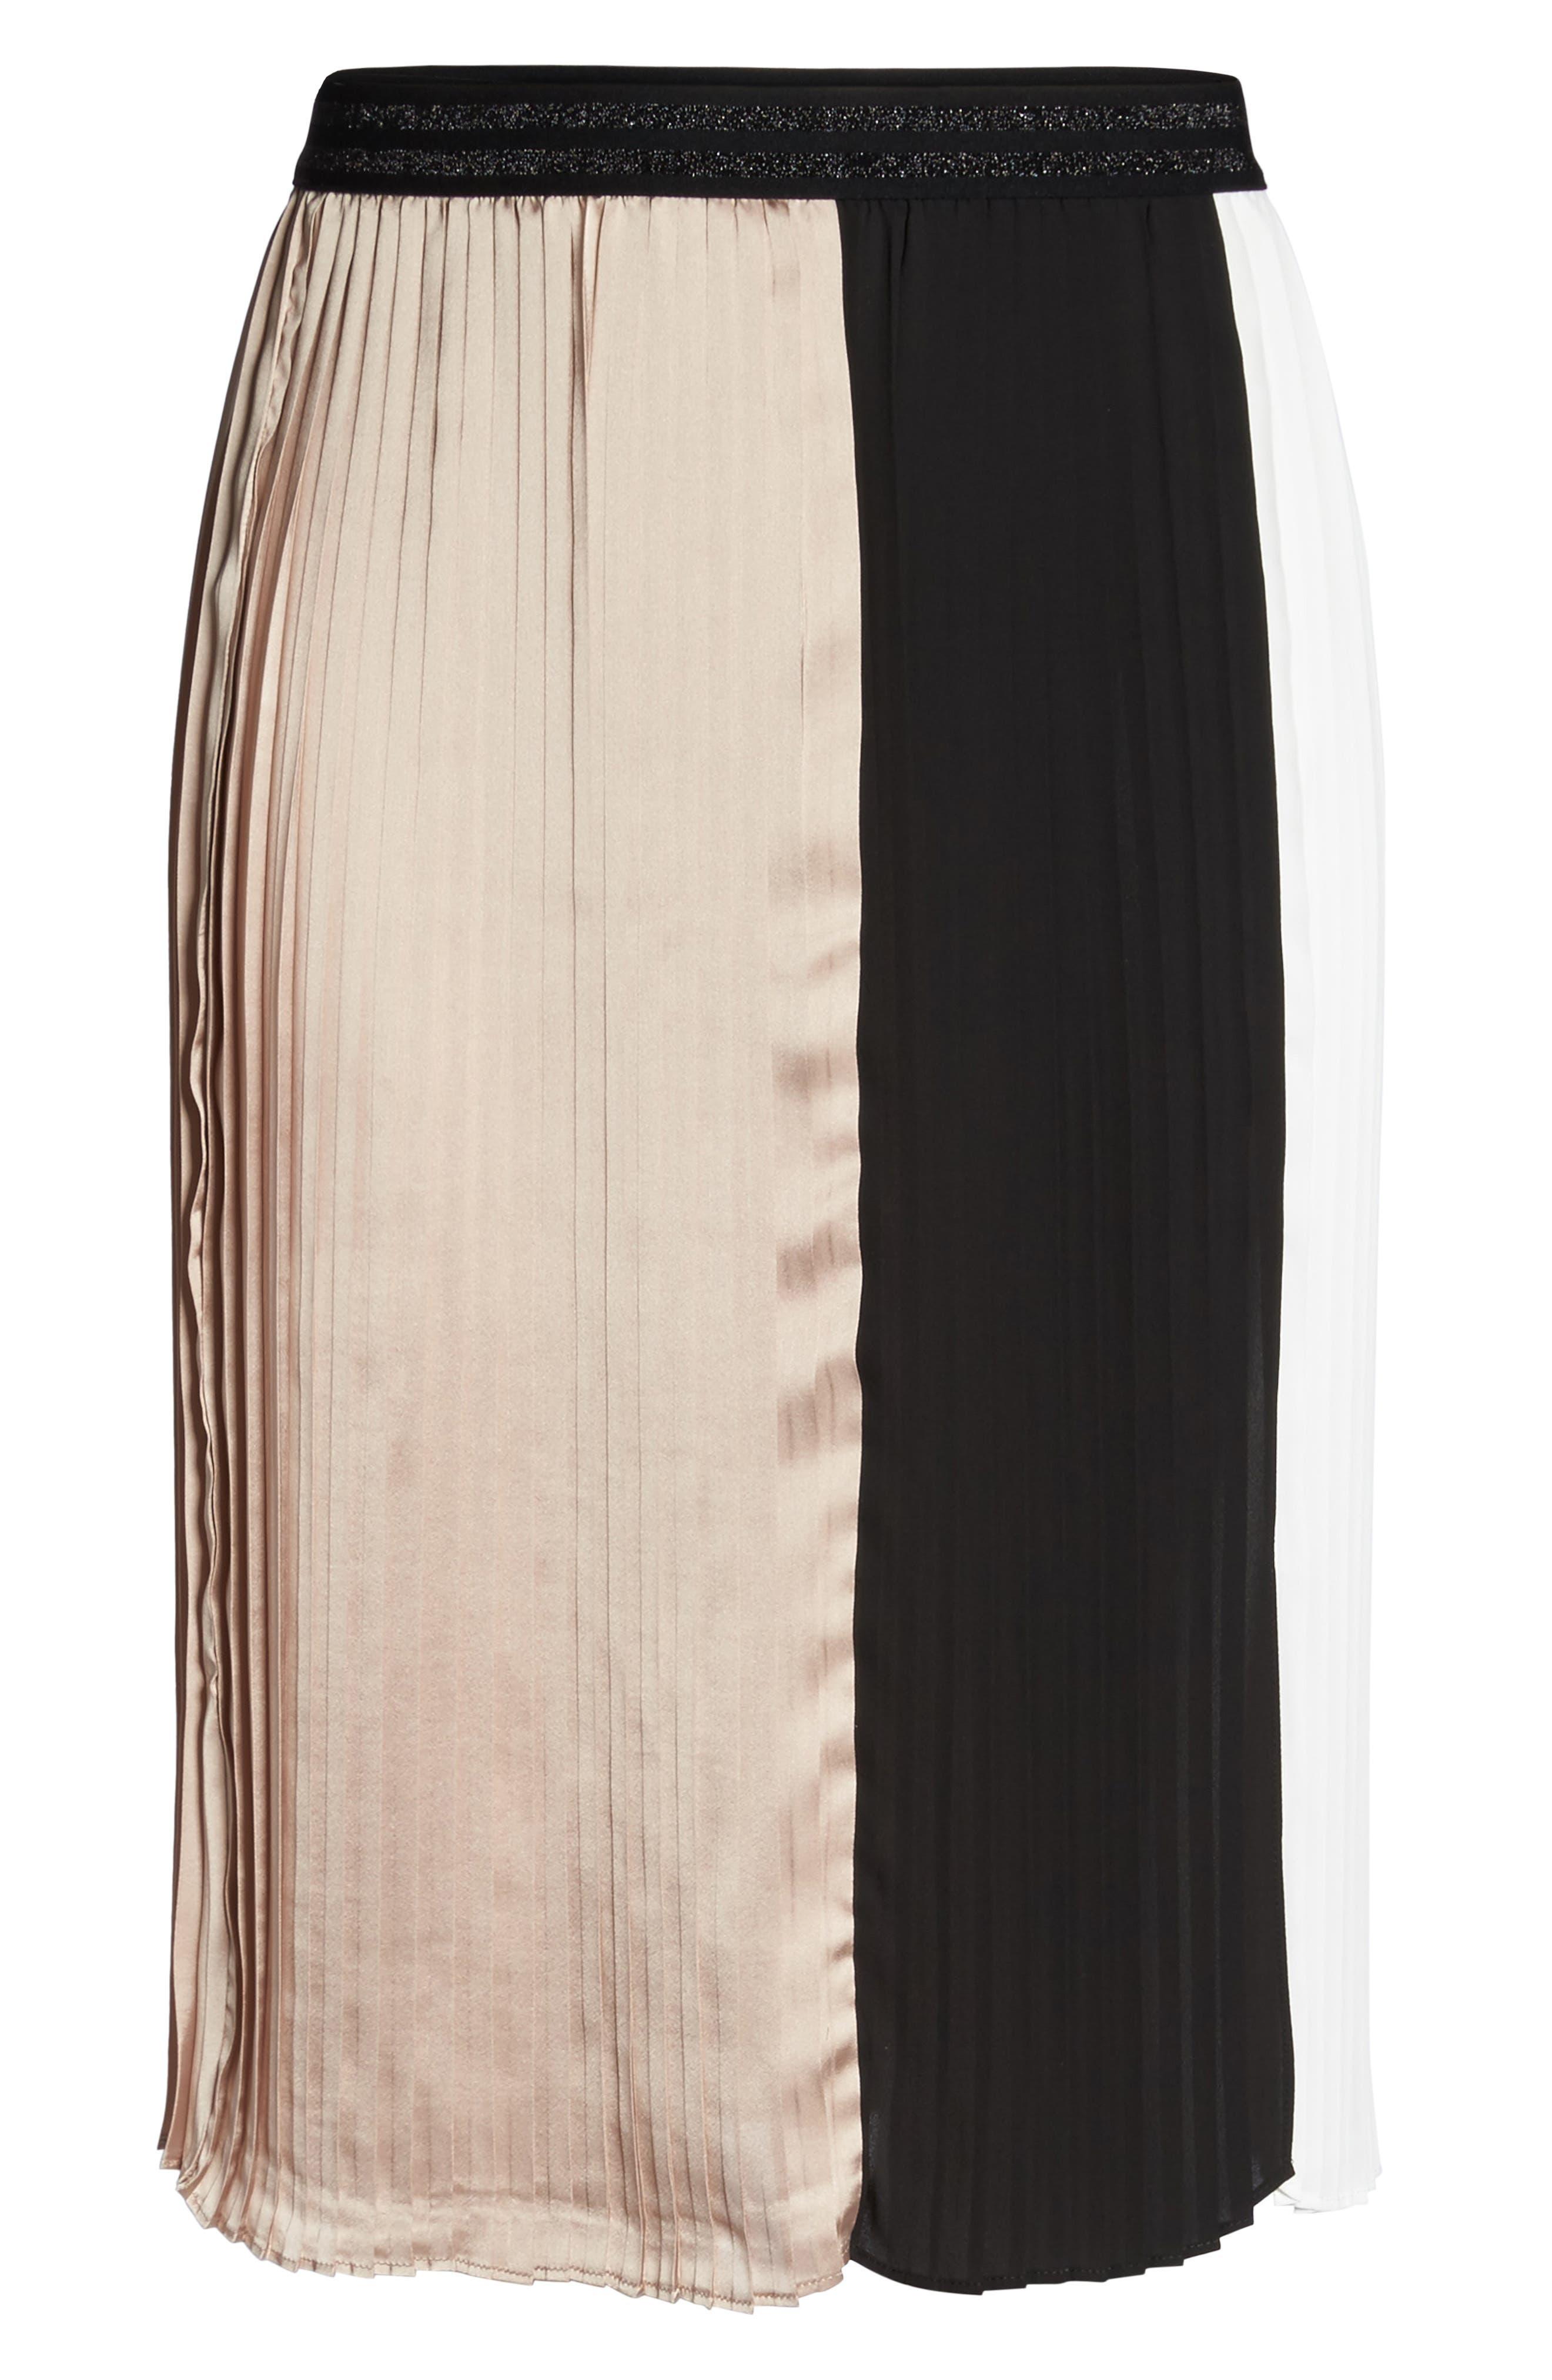 Colorblock Pleat Skirt,                             Alternate thumbnail 6, color,                             003